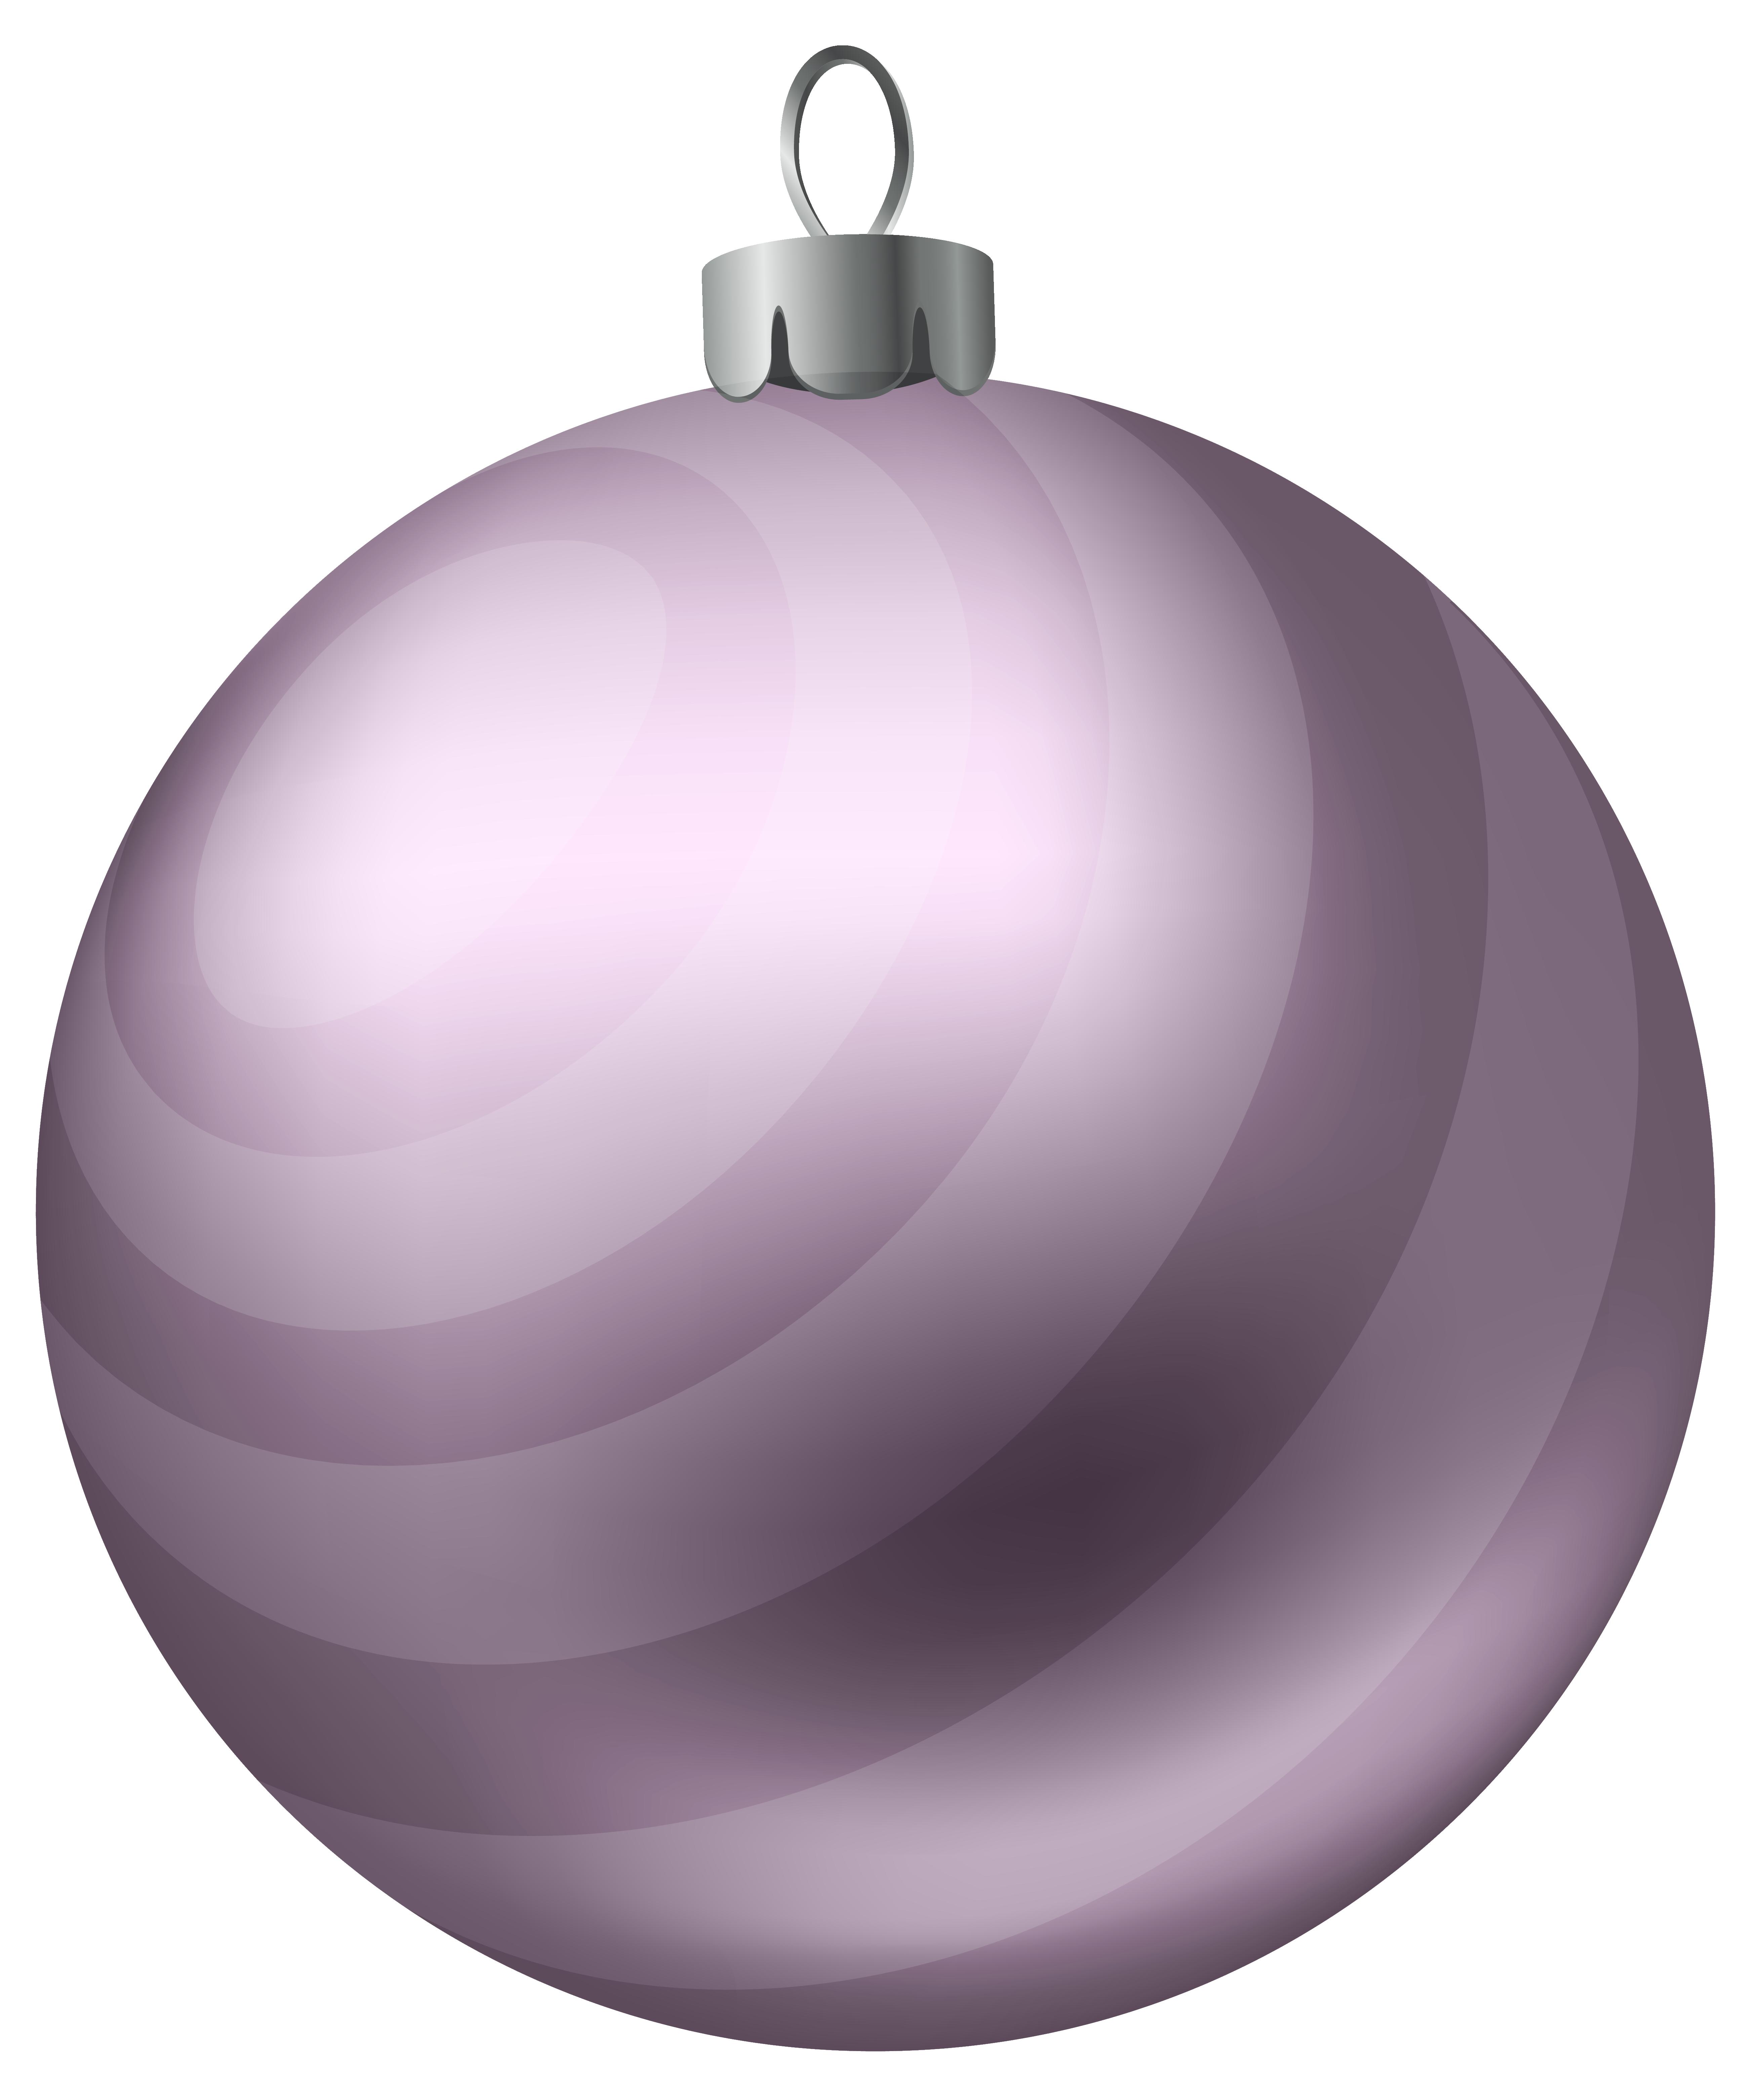 Keys clipart purple. Christmas ball soft png